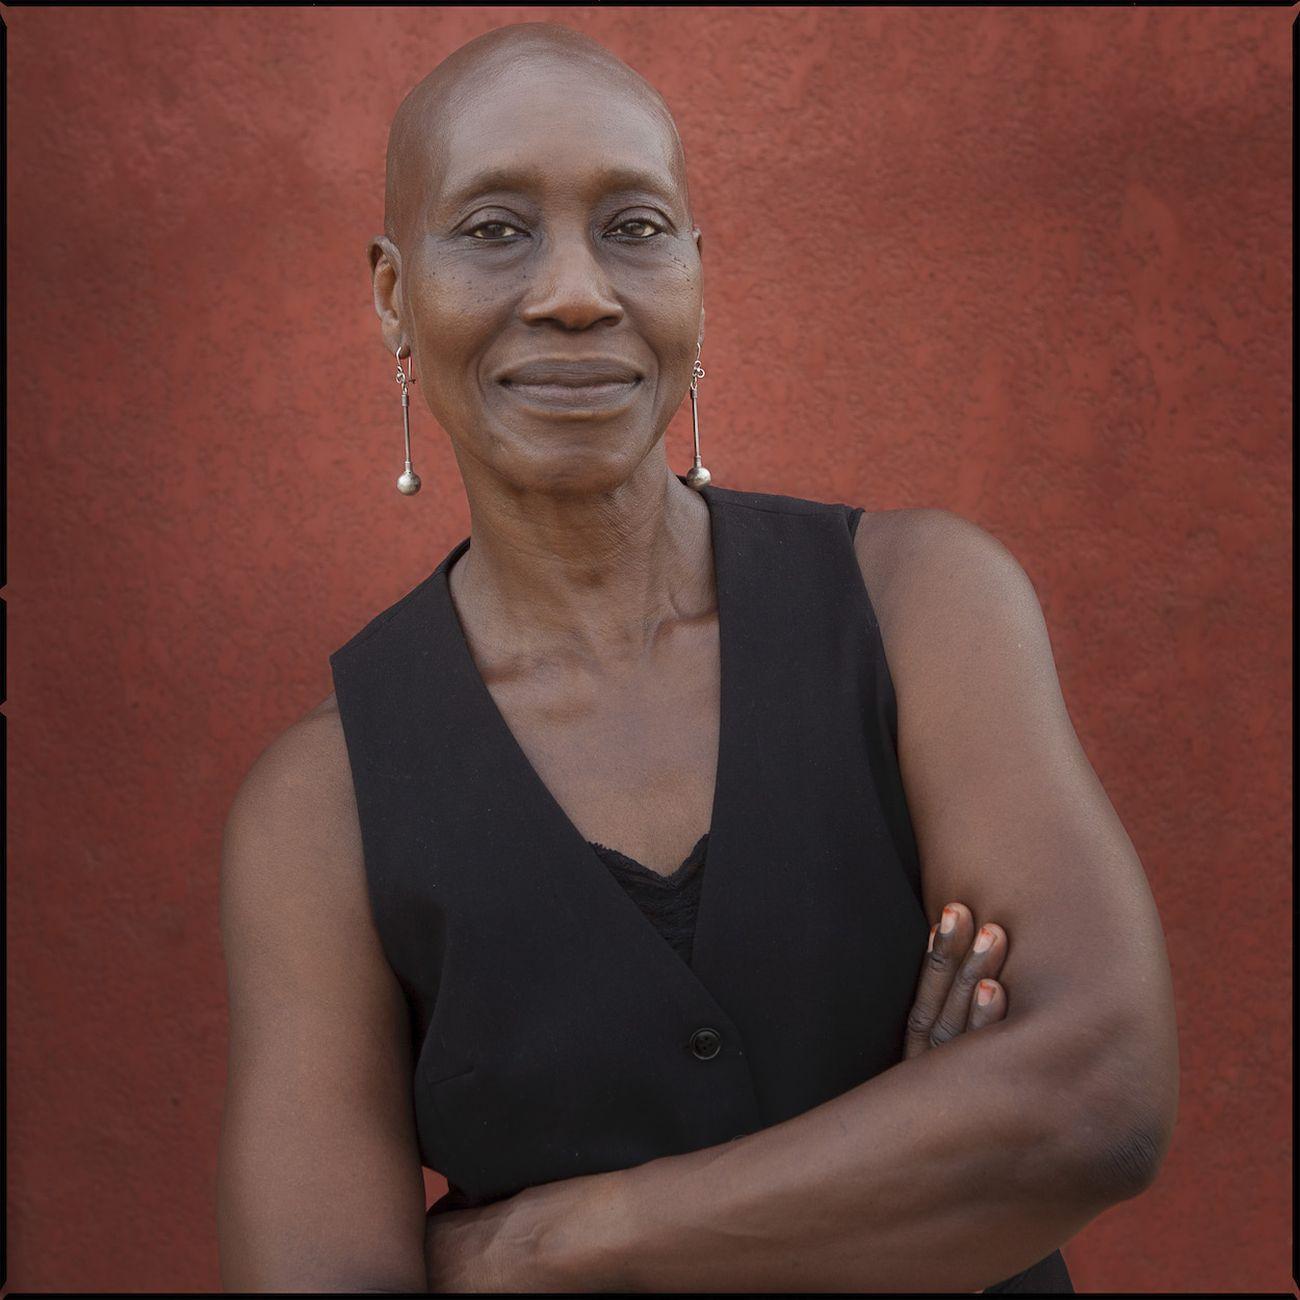 Germaine Acogny, Toubab Diallaw, 2012